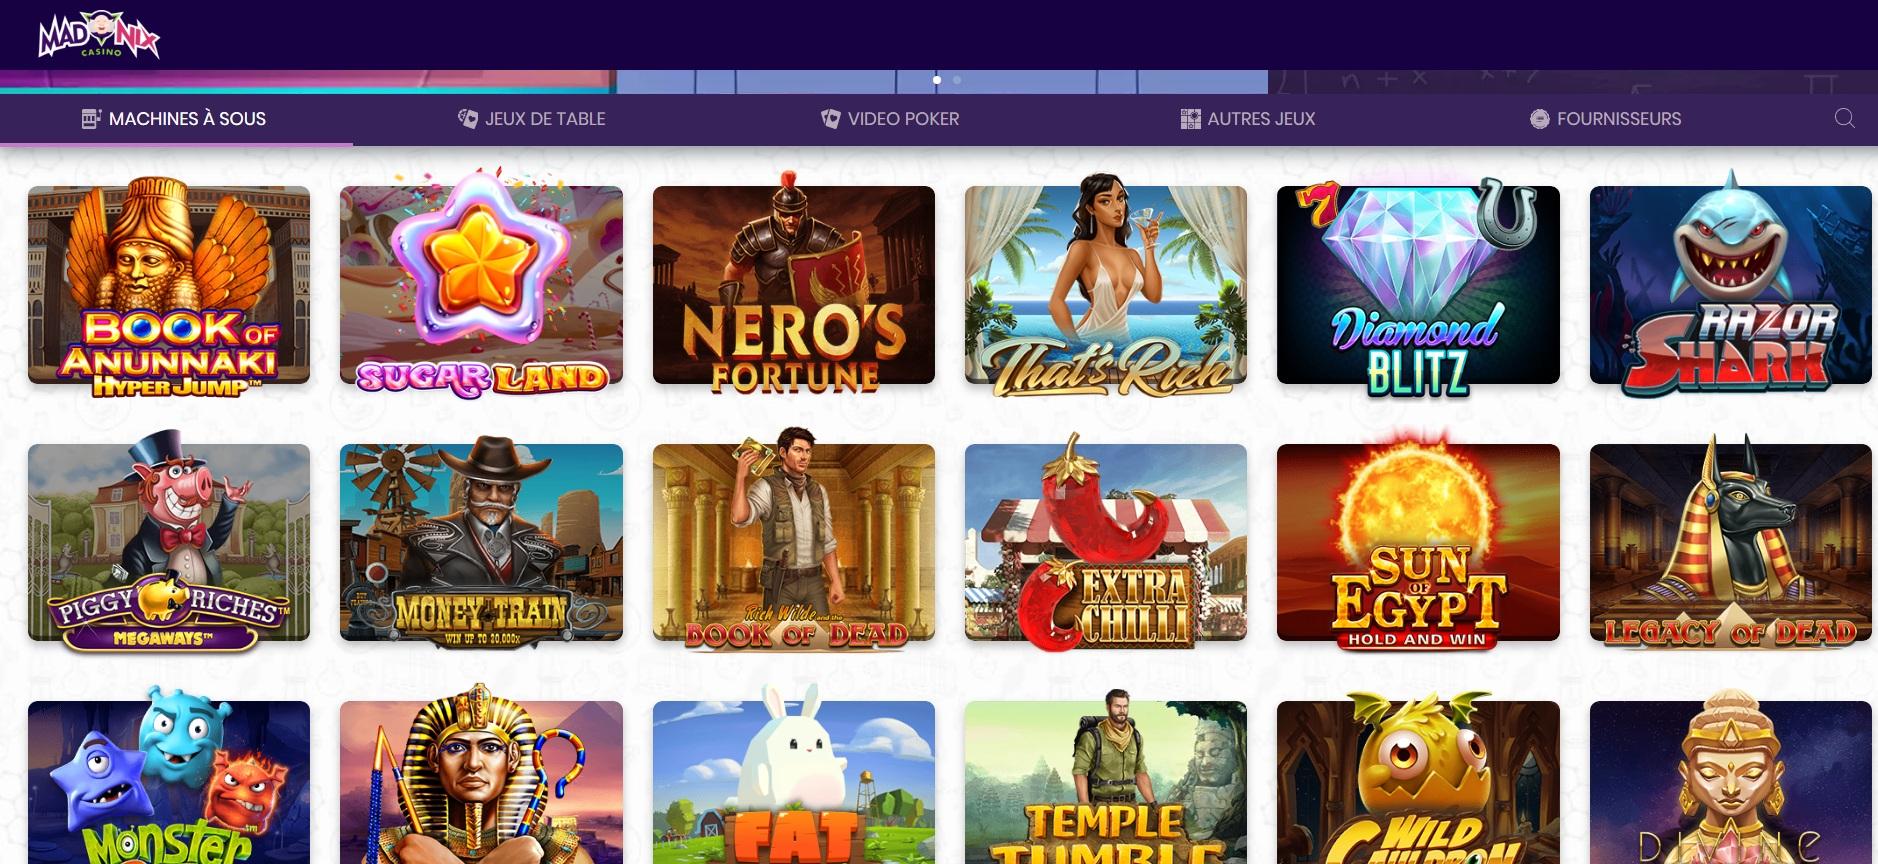 arnaque madnix casino